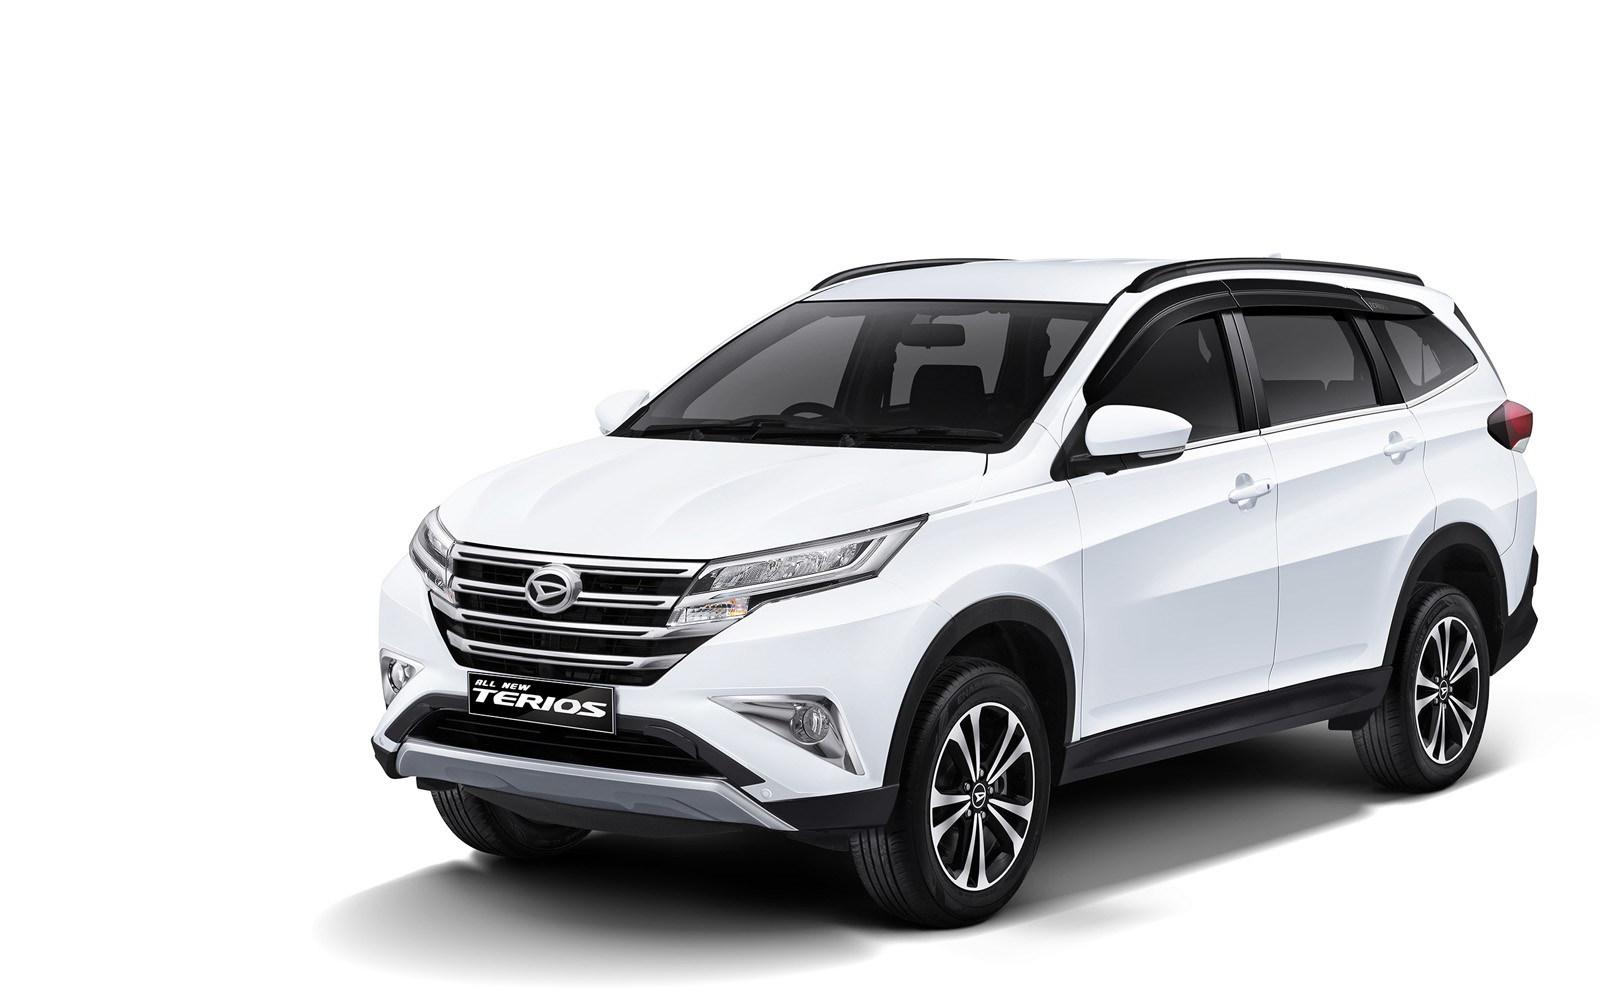 Subaru 7 Seater >> Comparison Daihatsu Terios 7 Seater 2018 Vs Subaru